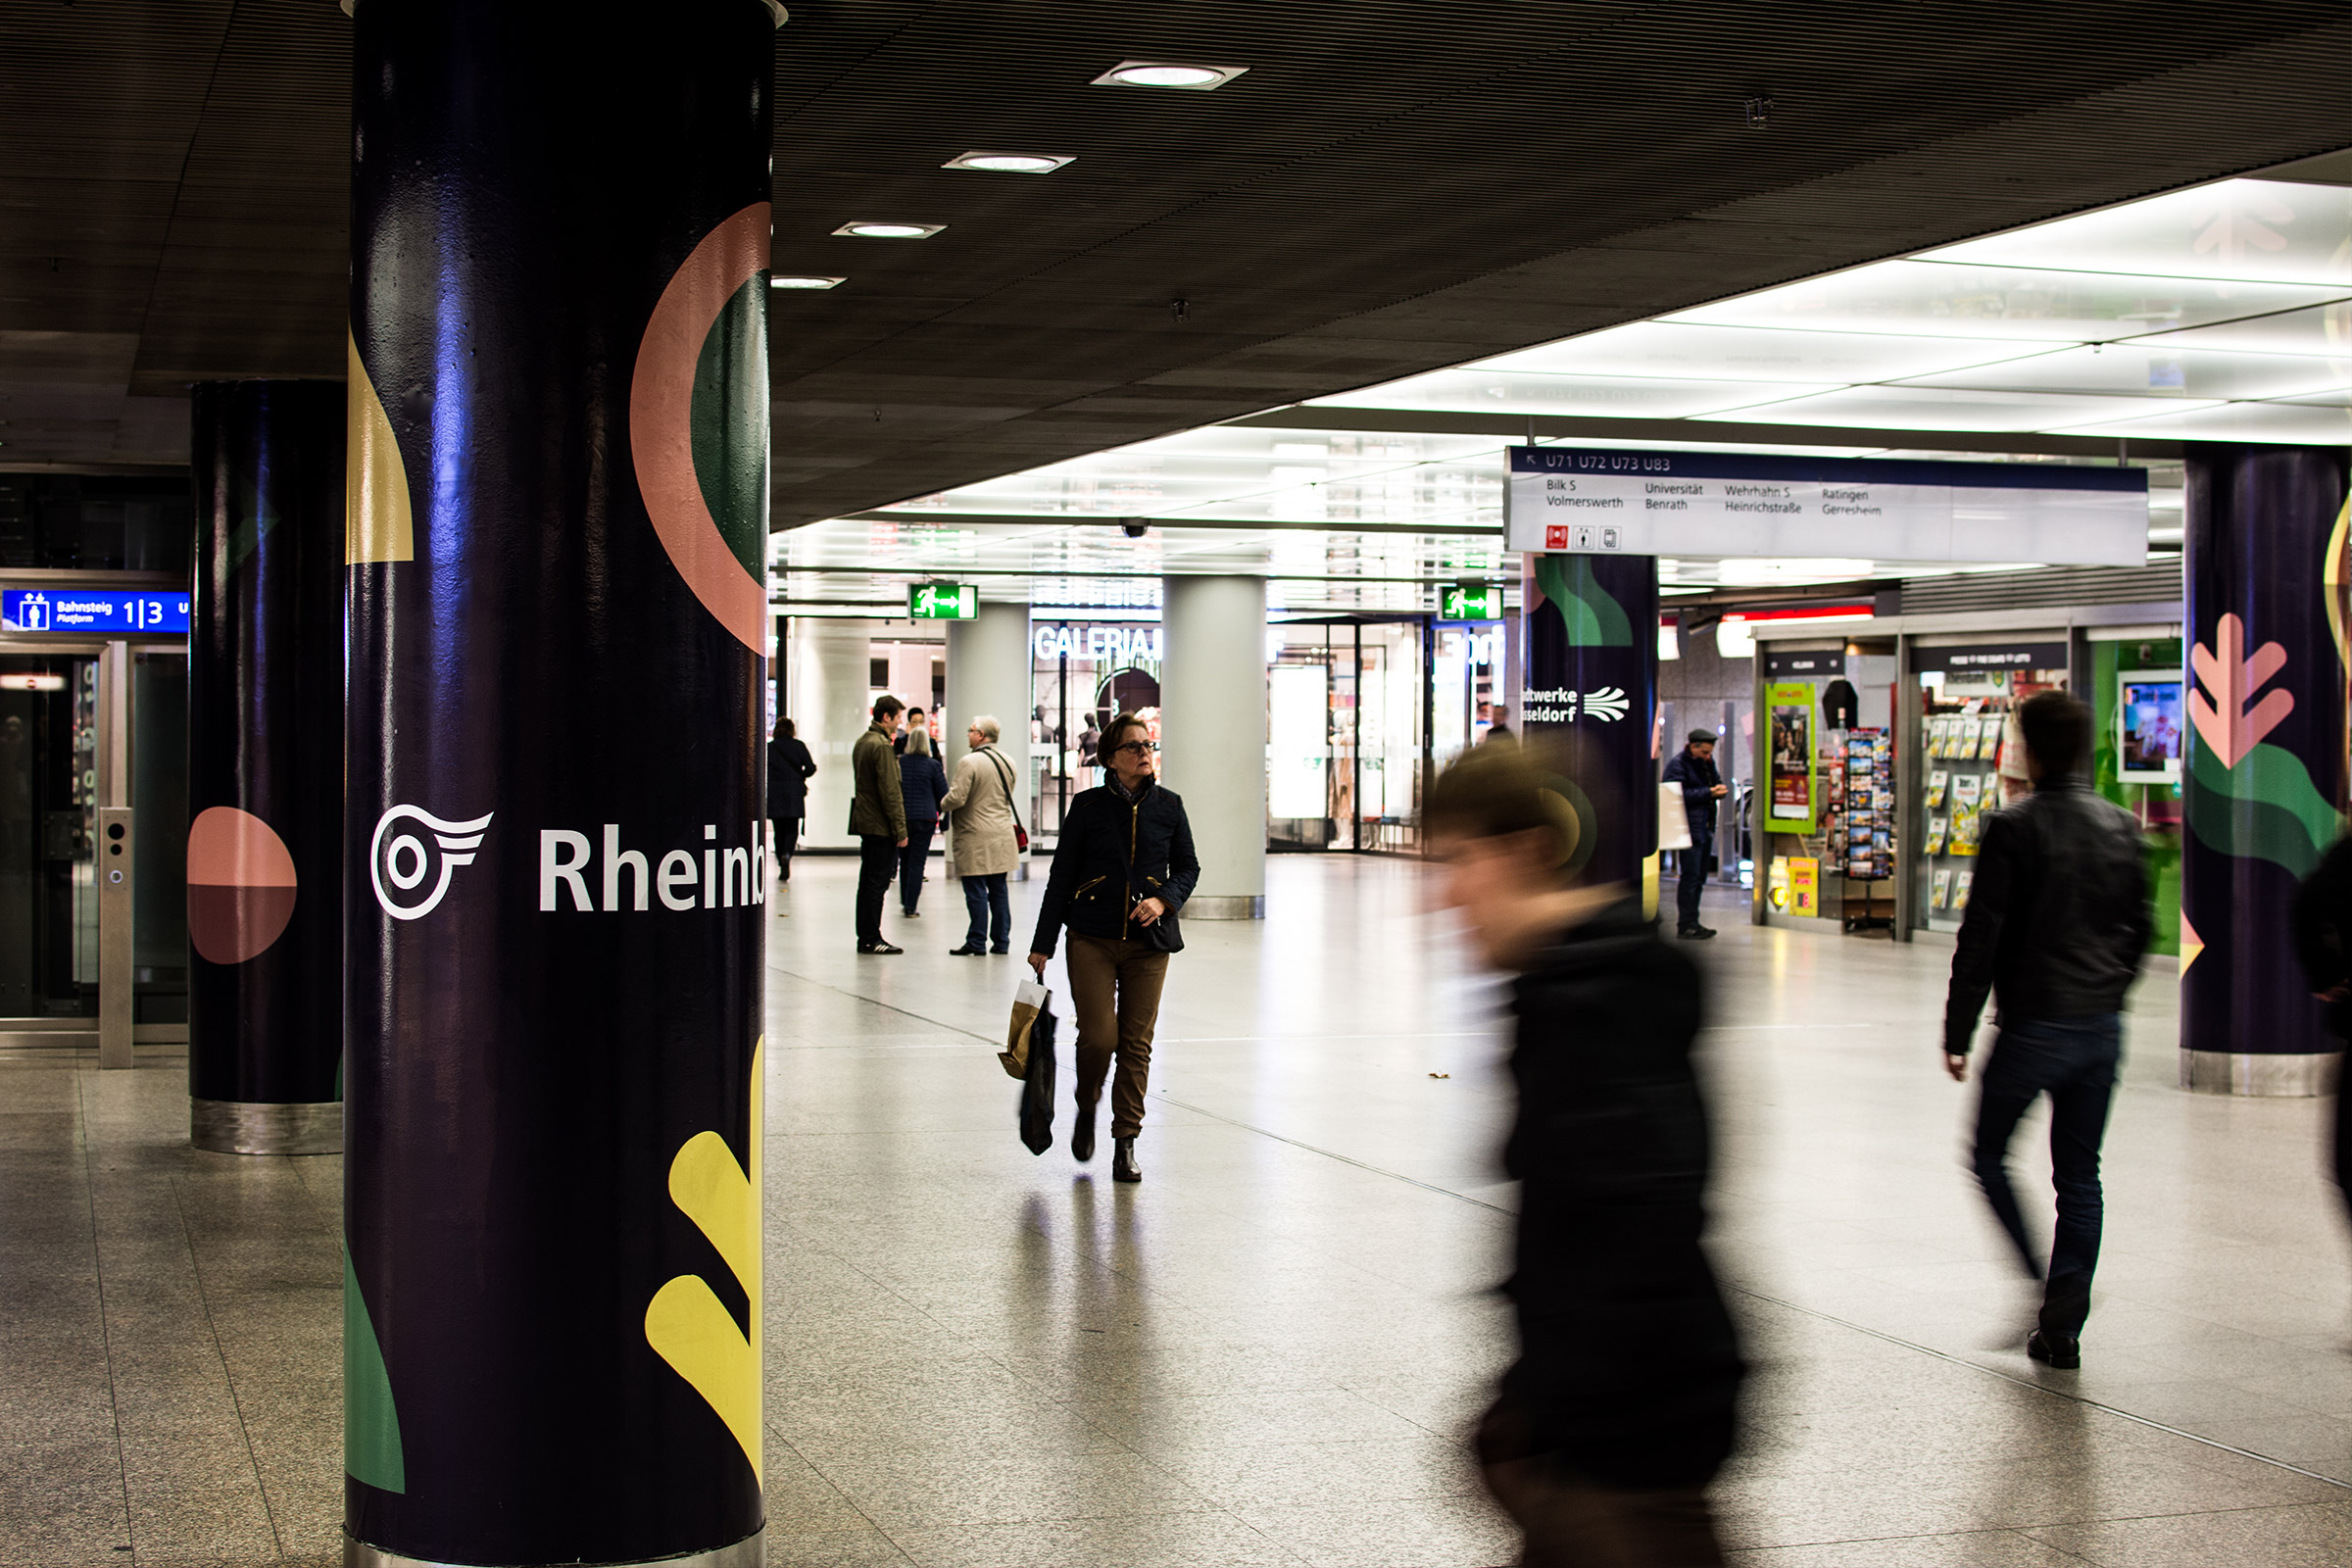 Düsseldorf, Heinrich-Heine-Allee, U-Bahnhof, Beklebung, New Fall Festival, Corporate Design, Branding